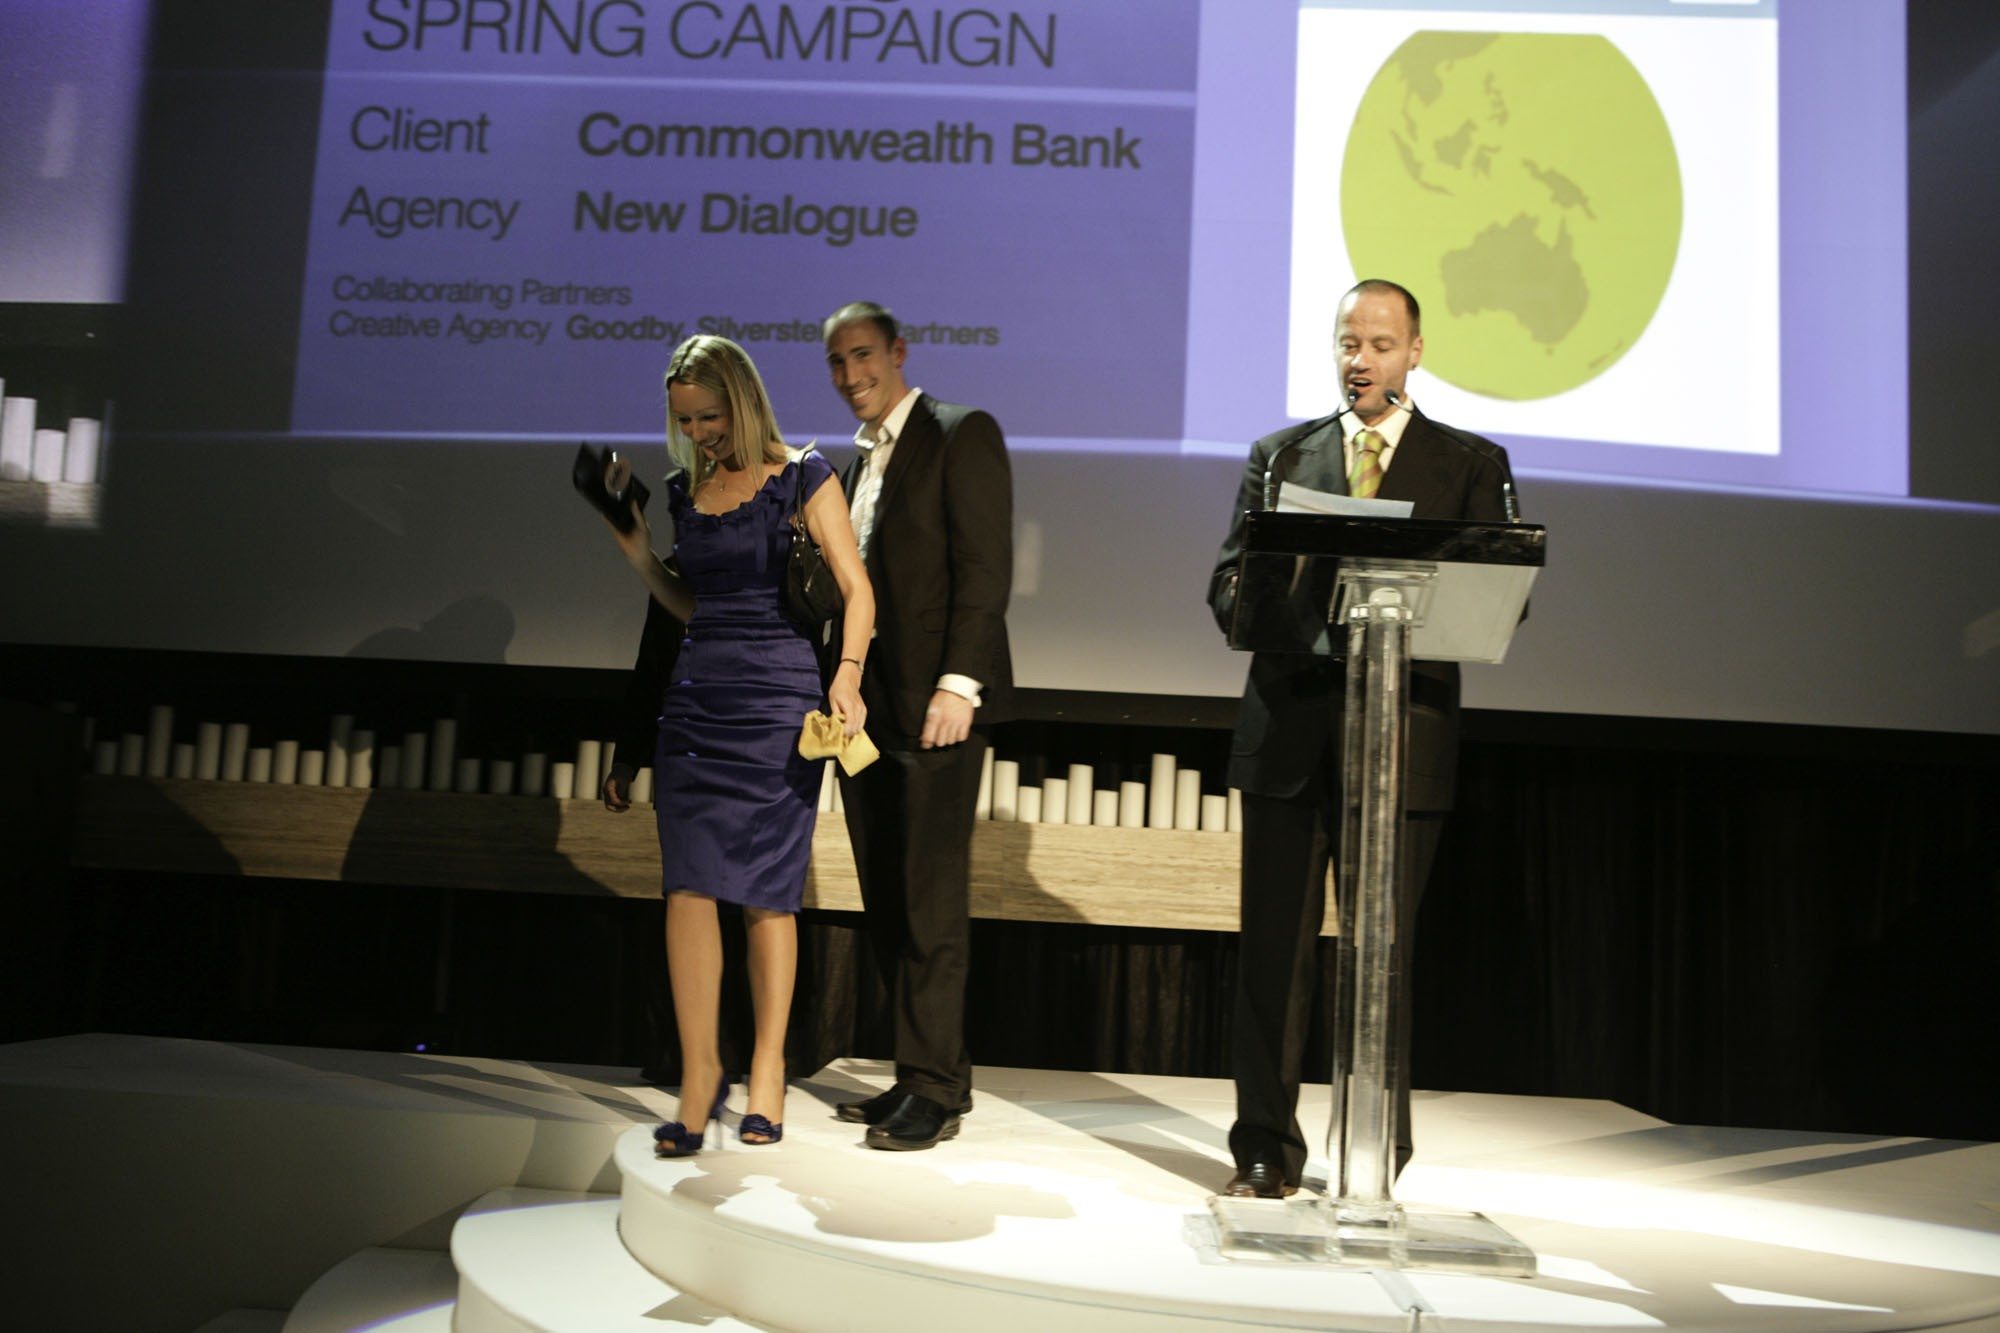 2009 IAB Award Direct Reponse and Lead Generation Winners